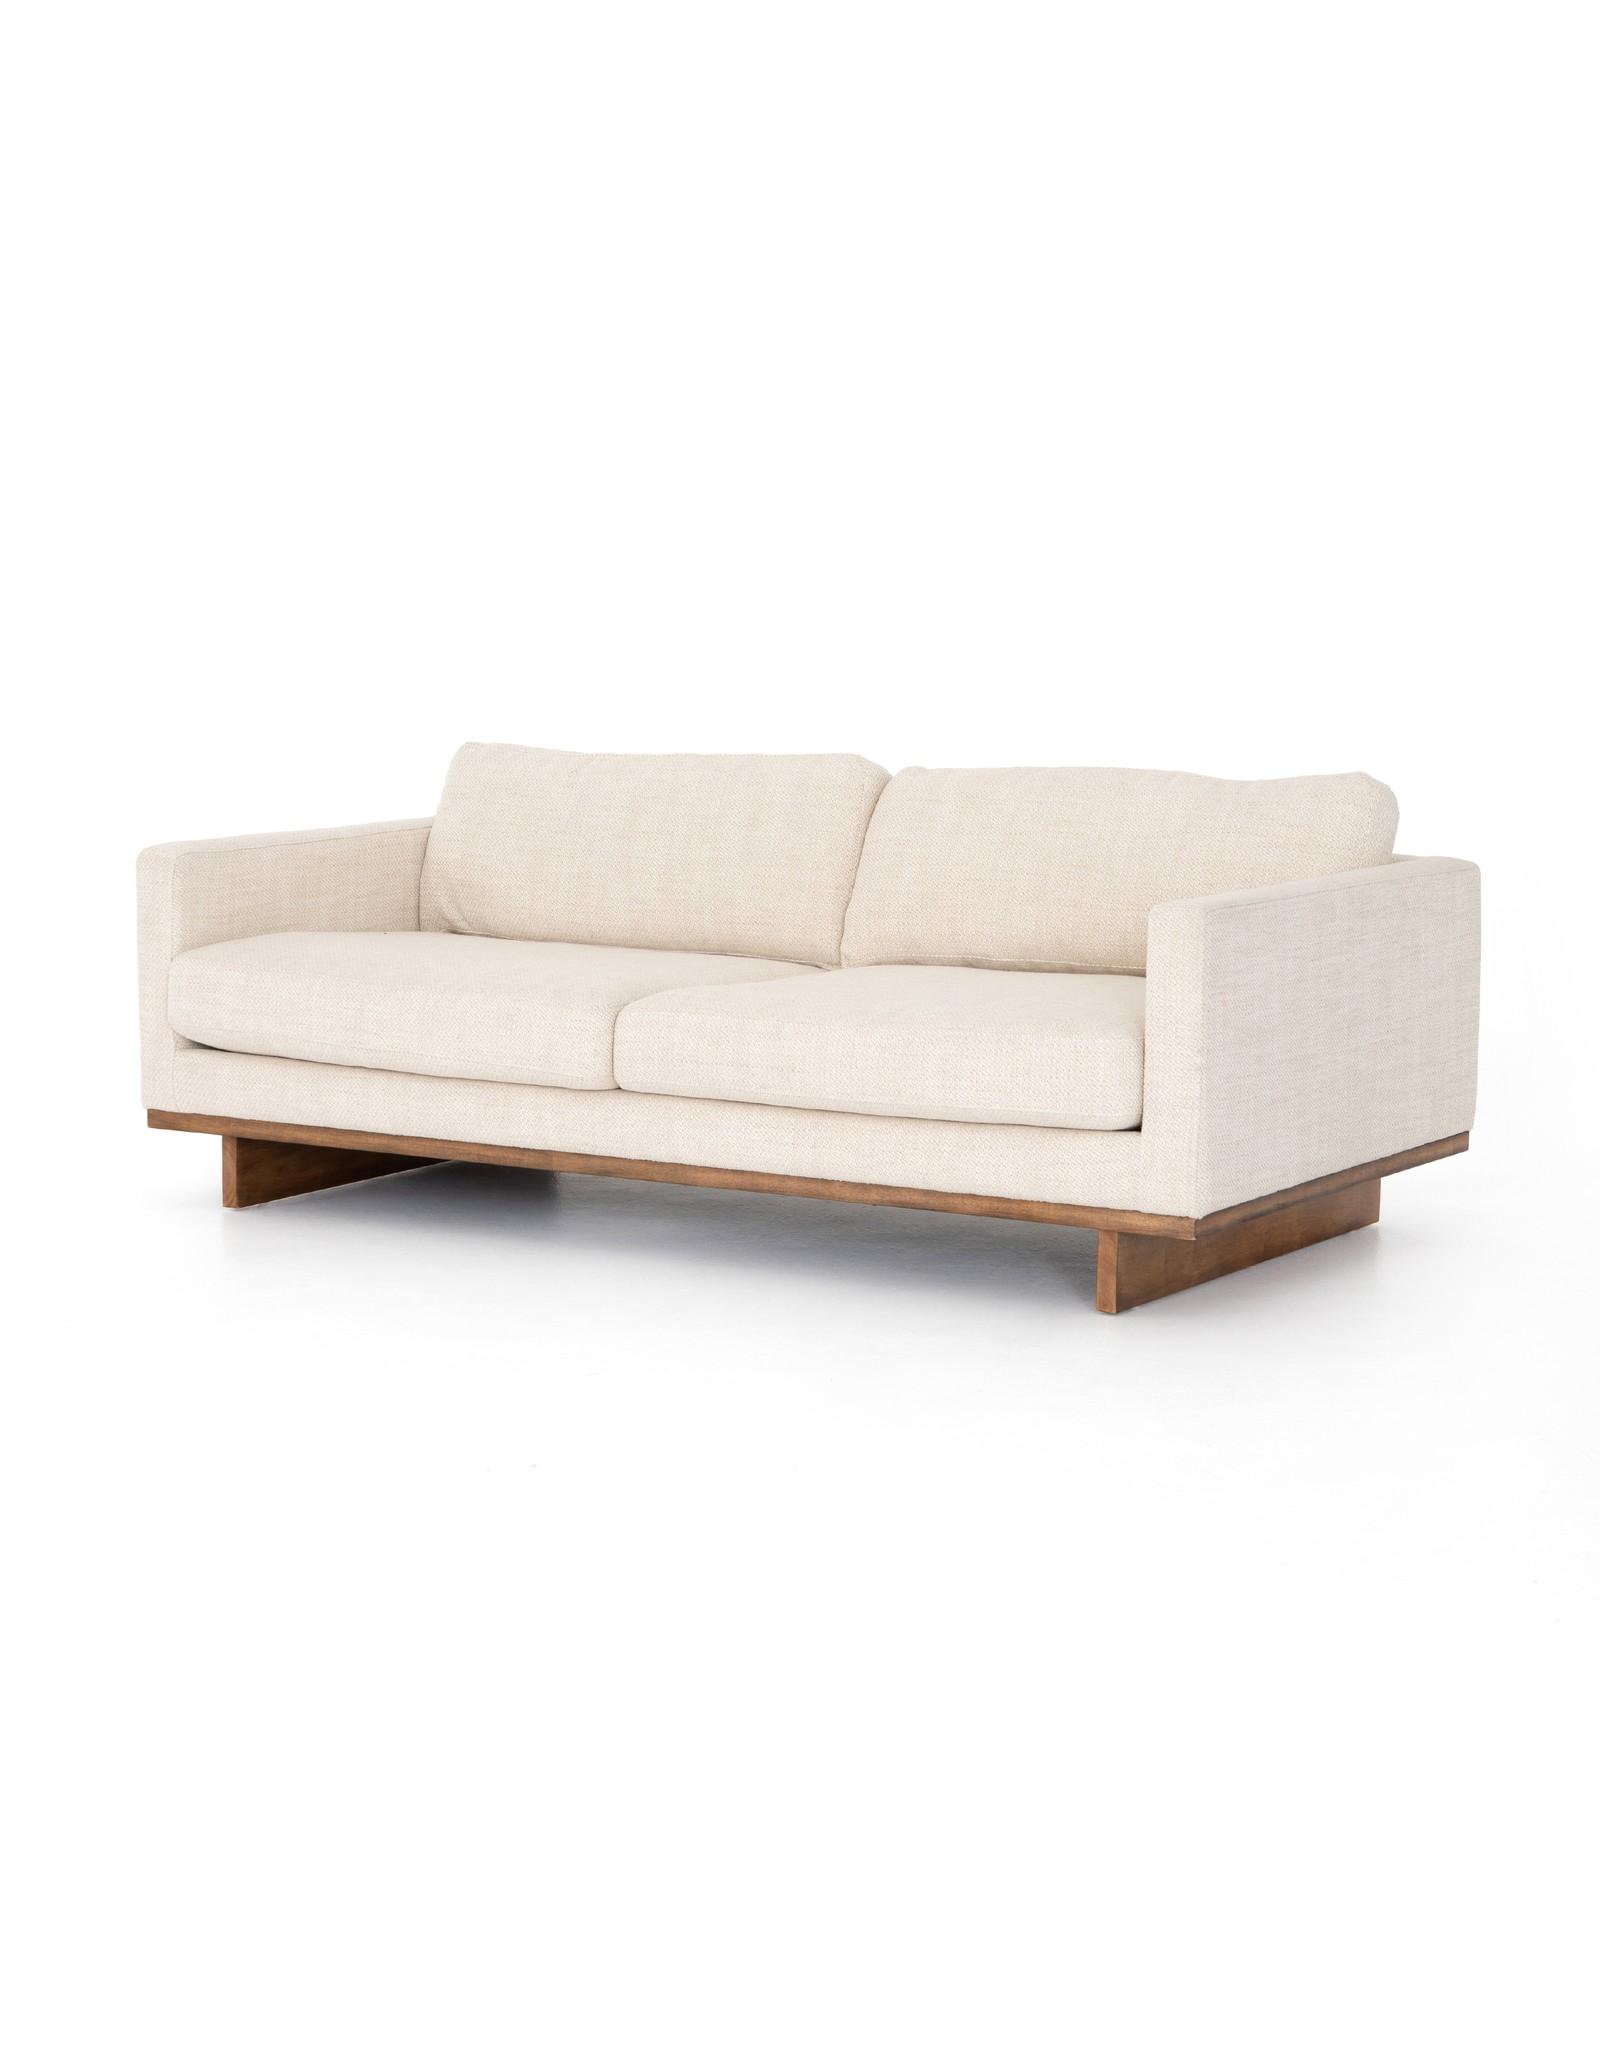 *Everly Sofa